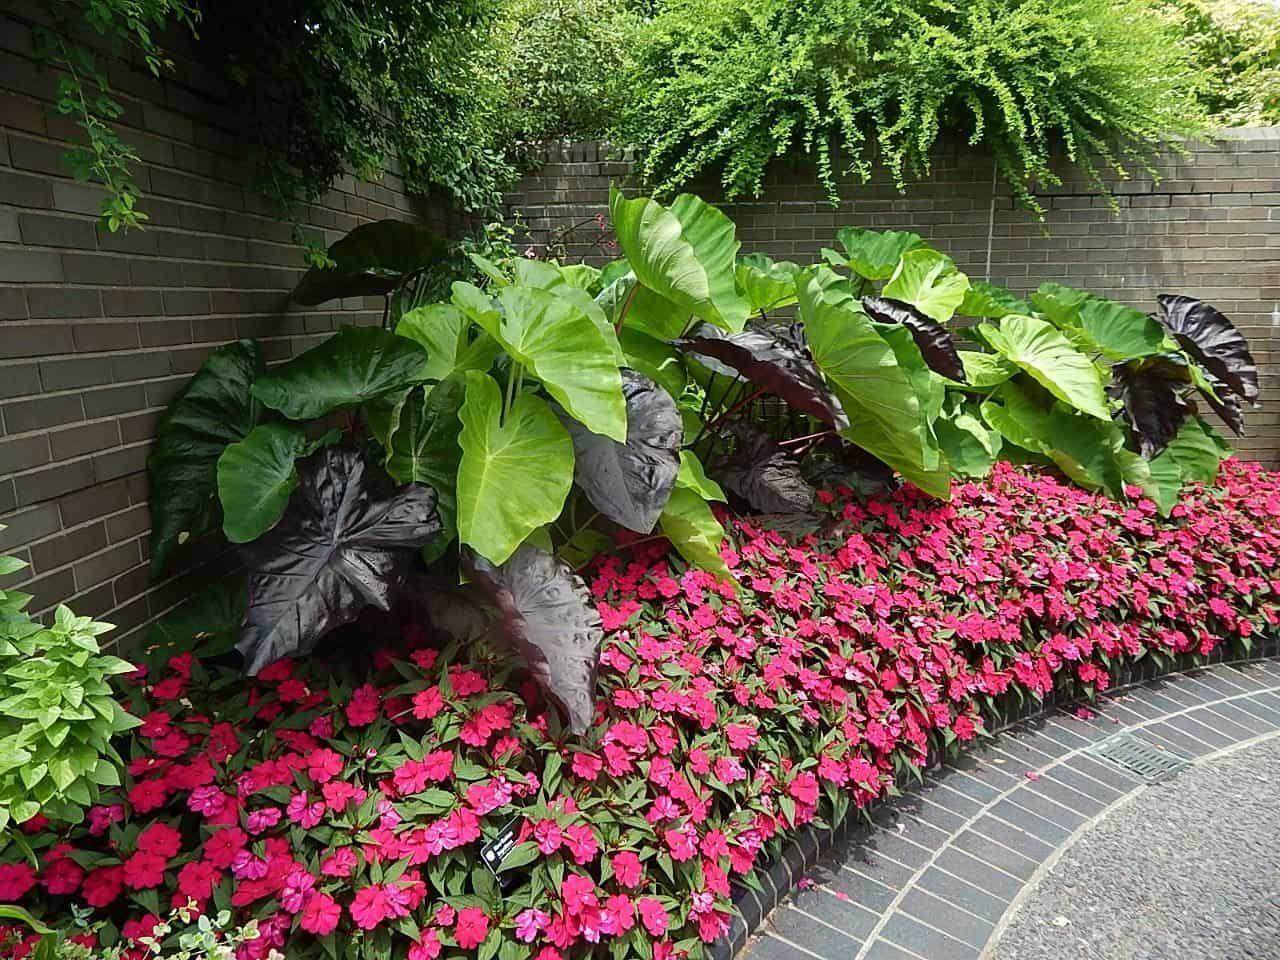 Corner Garden With Border And Elephant Ear Plants #elephantearsandtropicals